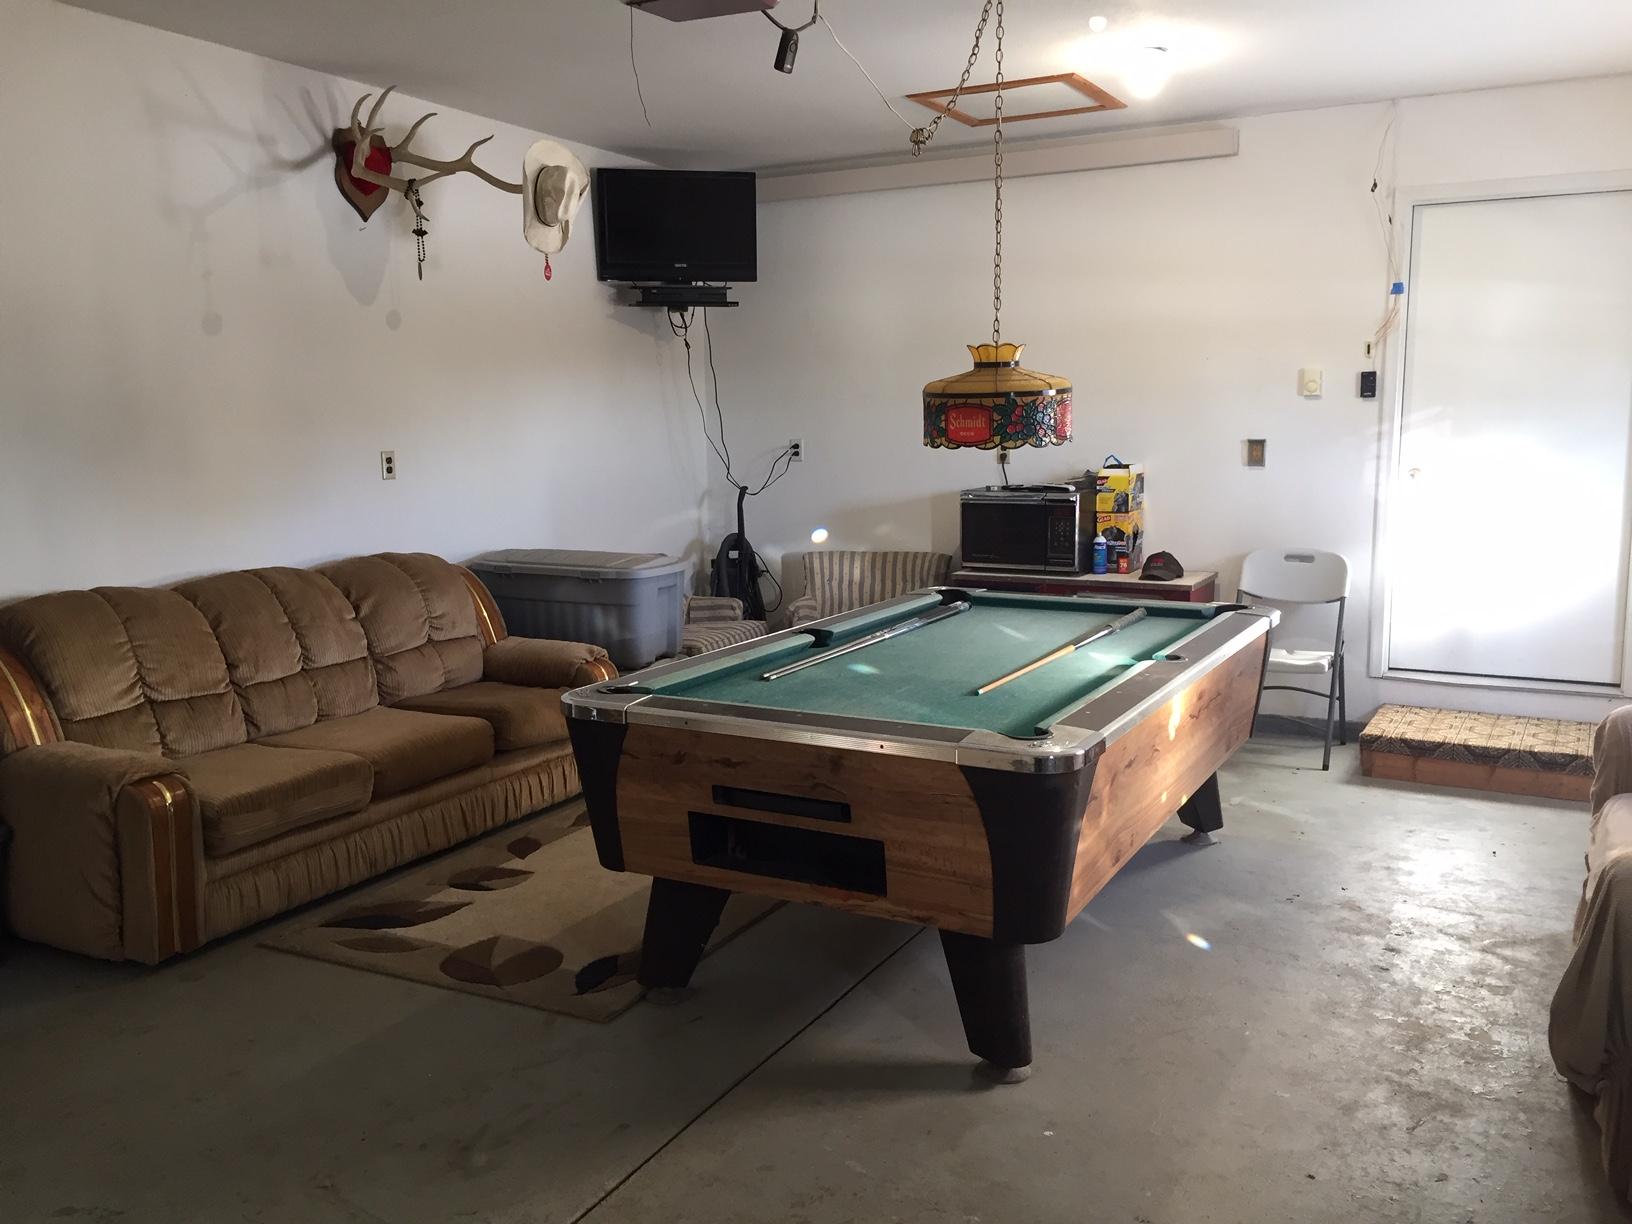 pool table and garage